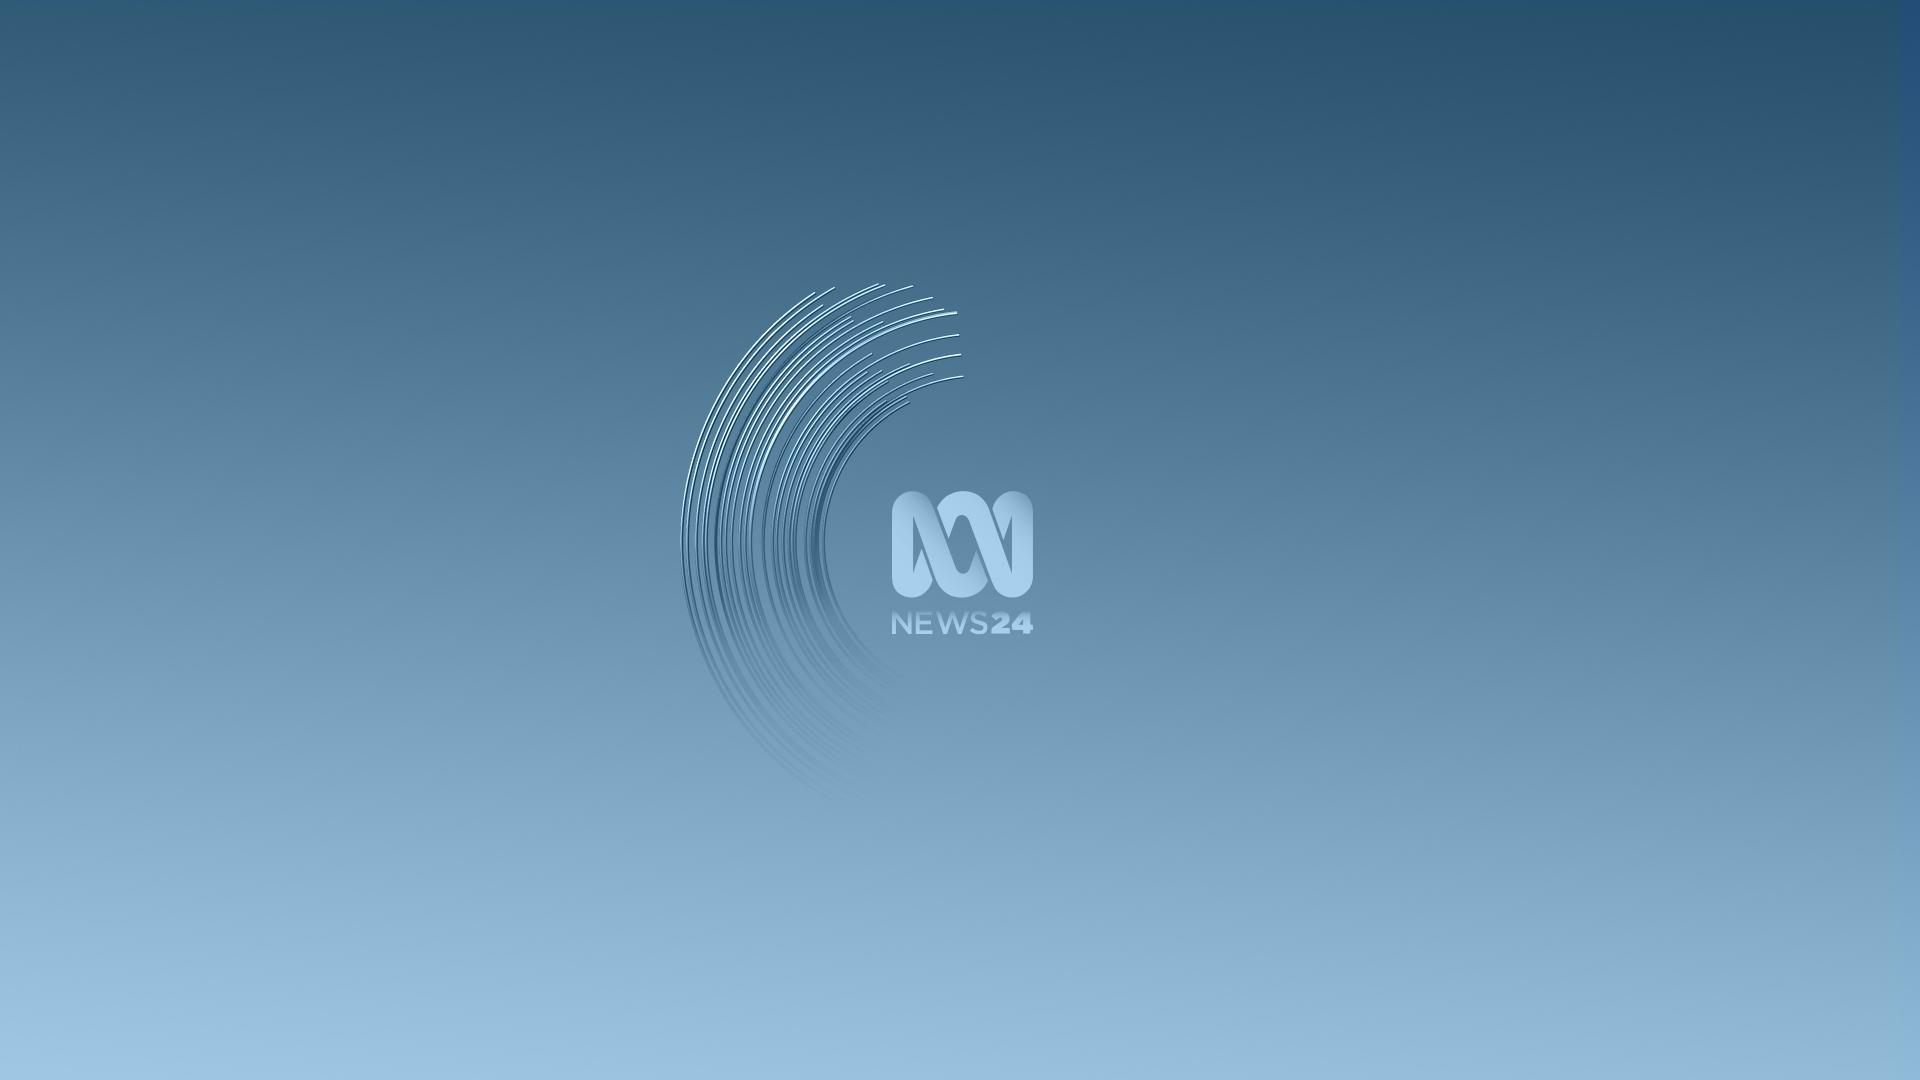 ABC_NEWS_24_Styleframe_headlines_v01